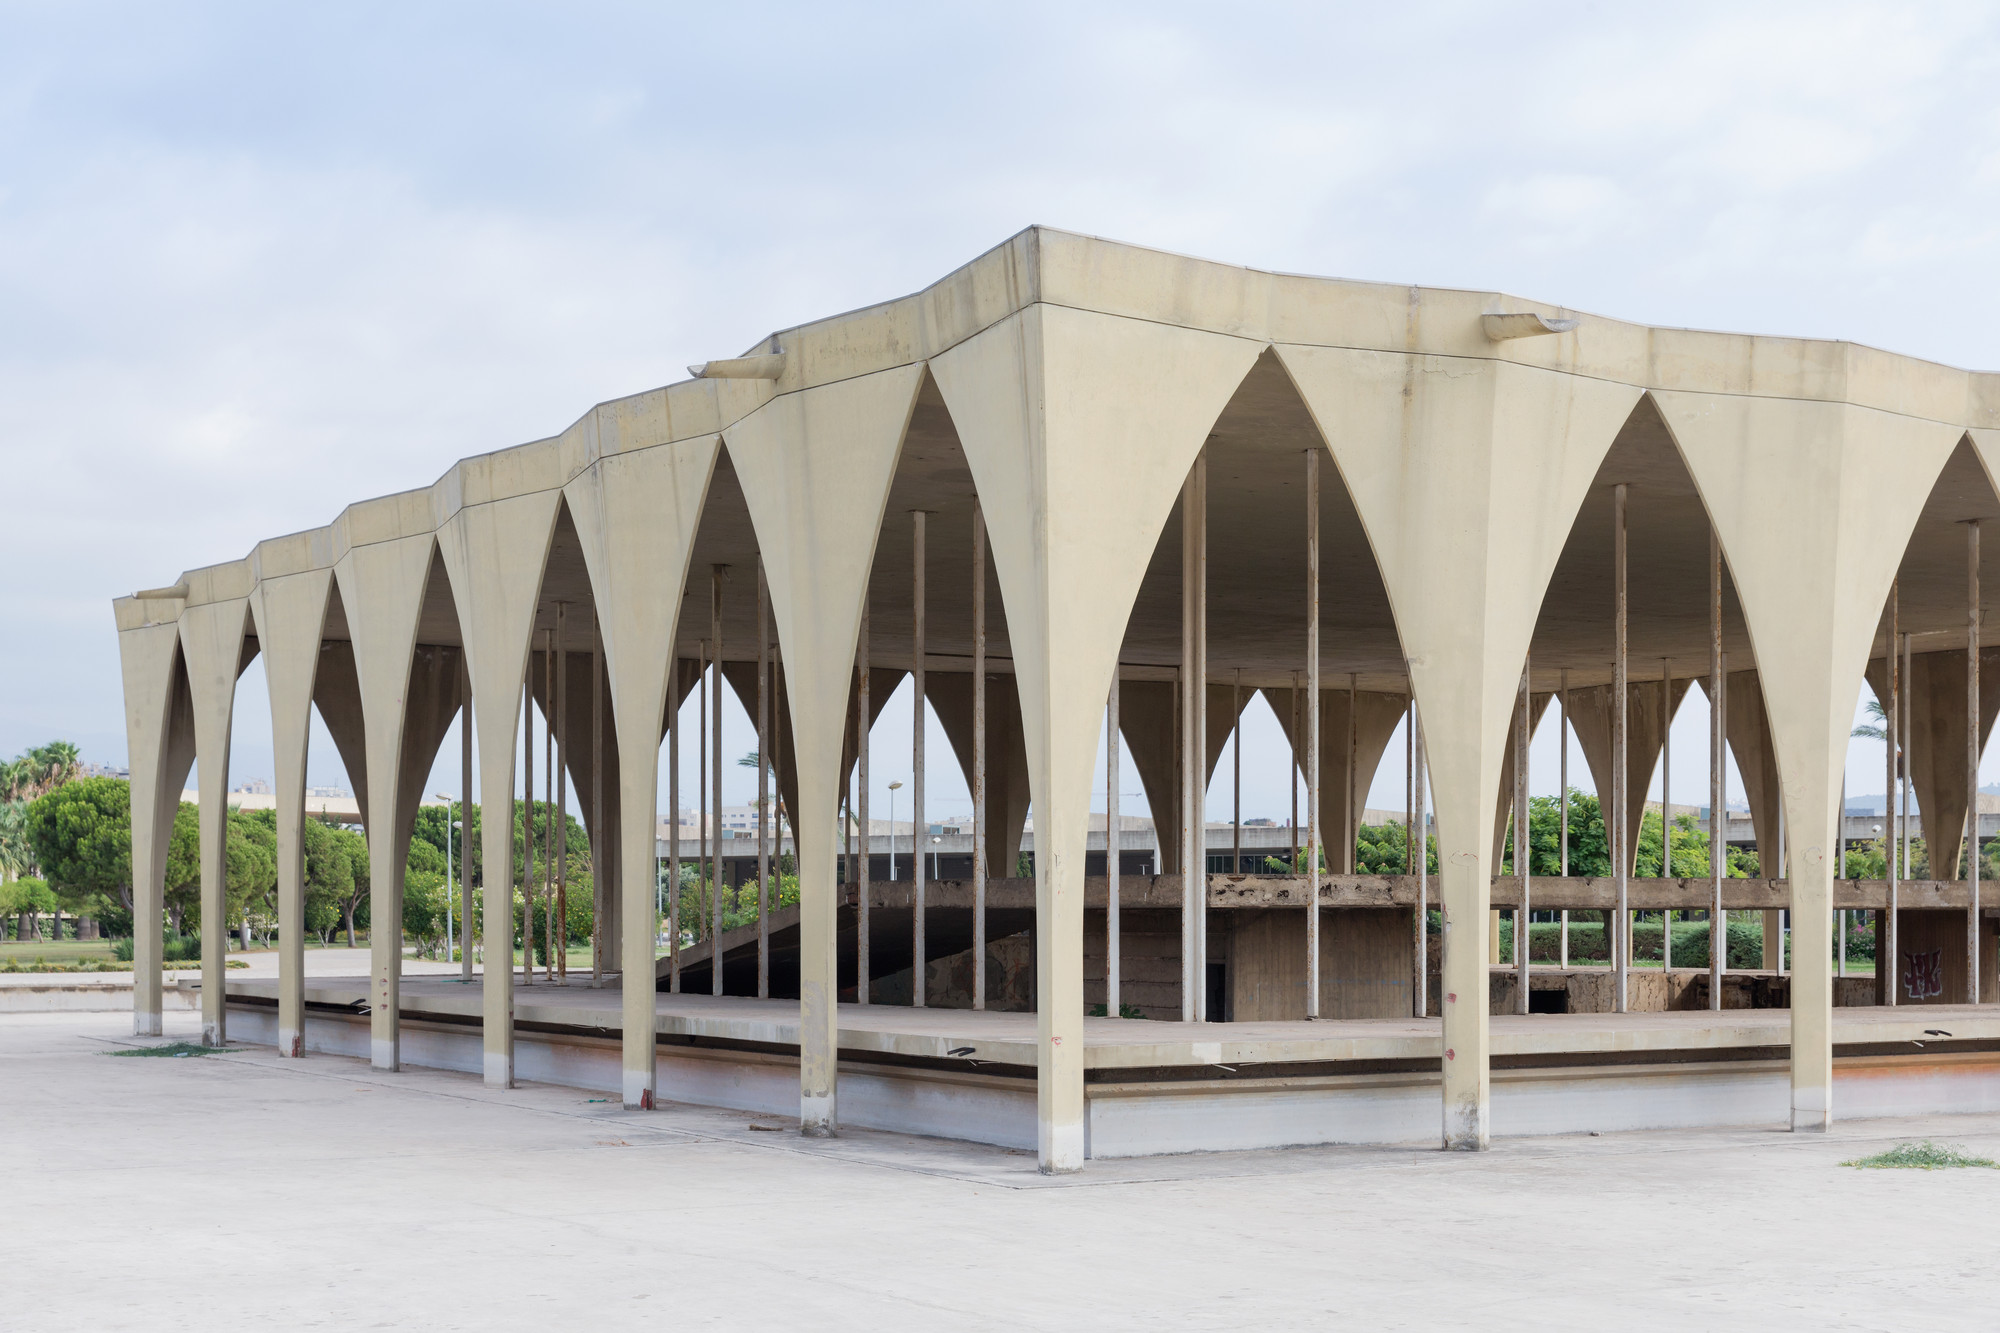 Feria Internacional de Trípoli, de Oscar Niemeyer; Trípoli. Imagen © Iwan Baan